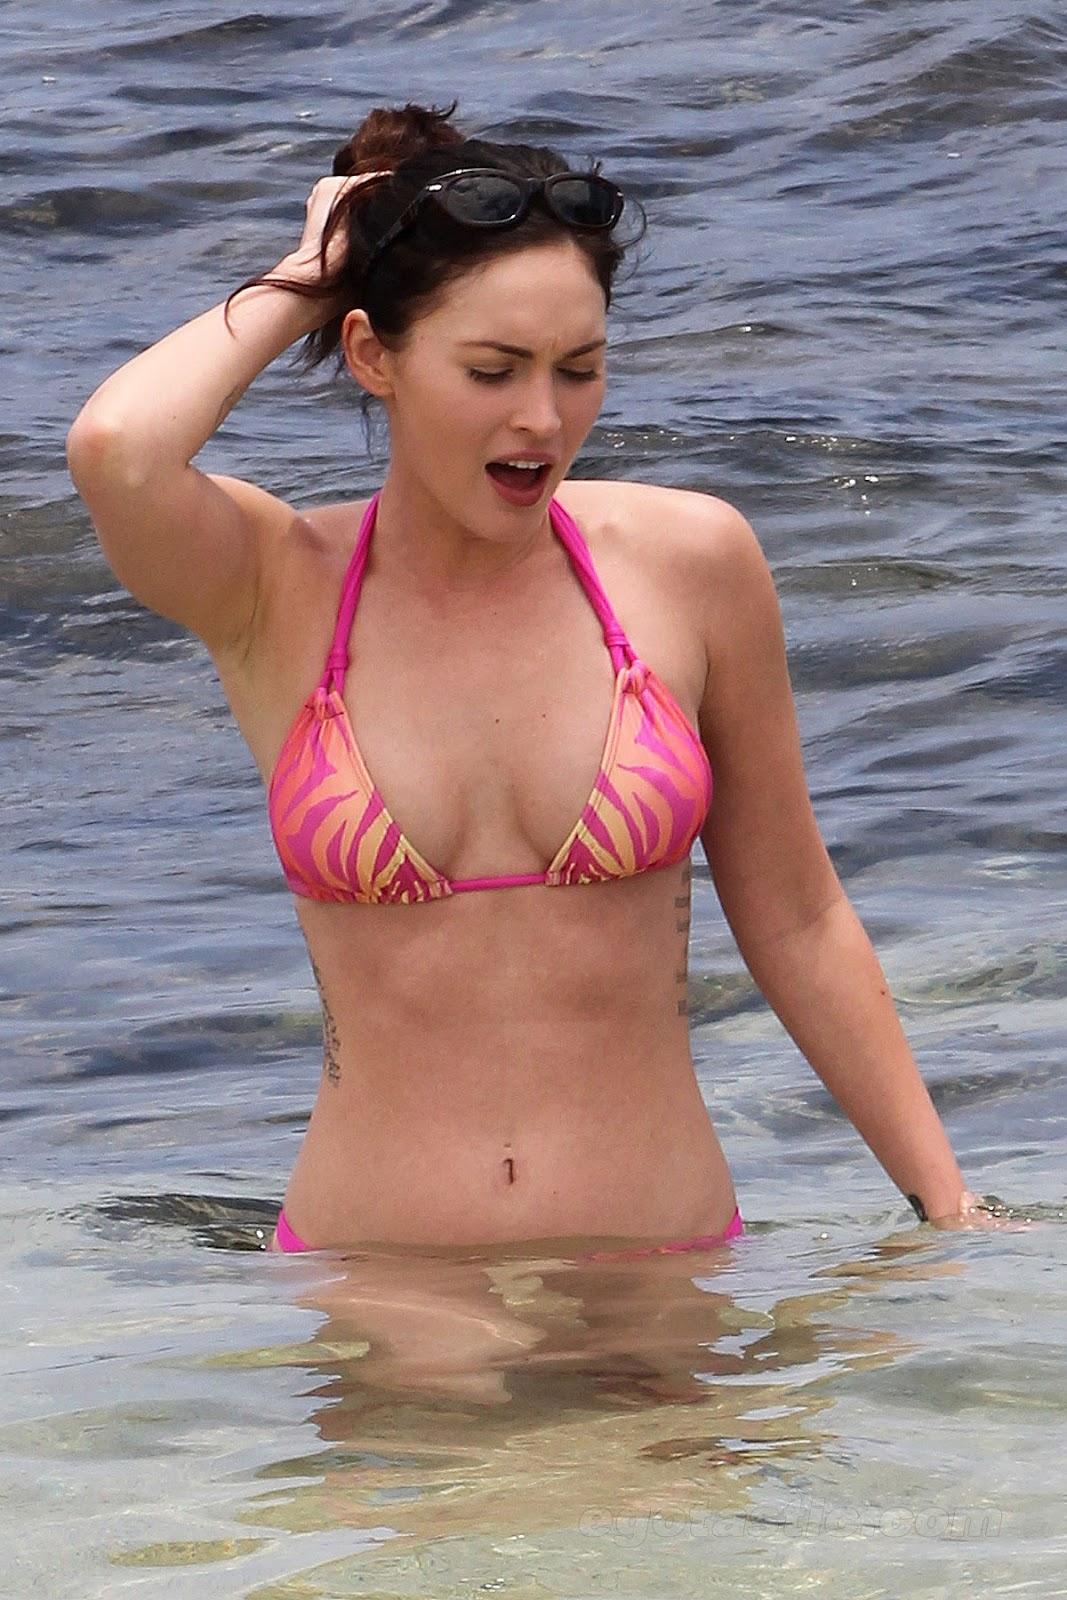 http://4.bp.blogspot.com/-4jPzGqgxXCs/T6vshrDY1xI/AAAAAAAAAB0/vfyGzeECPF0/s1600/done+megax+fox+in+bikini+.jpg